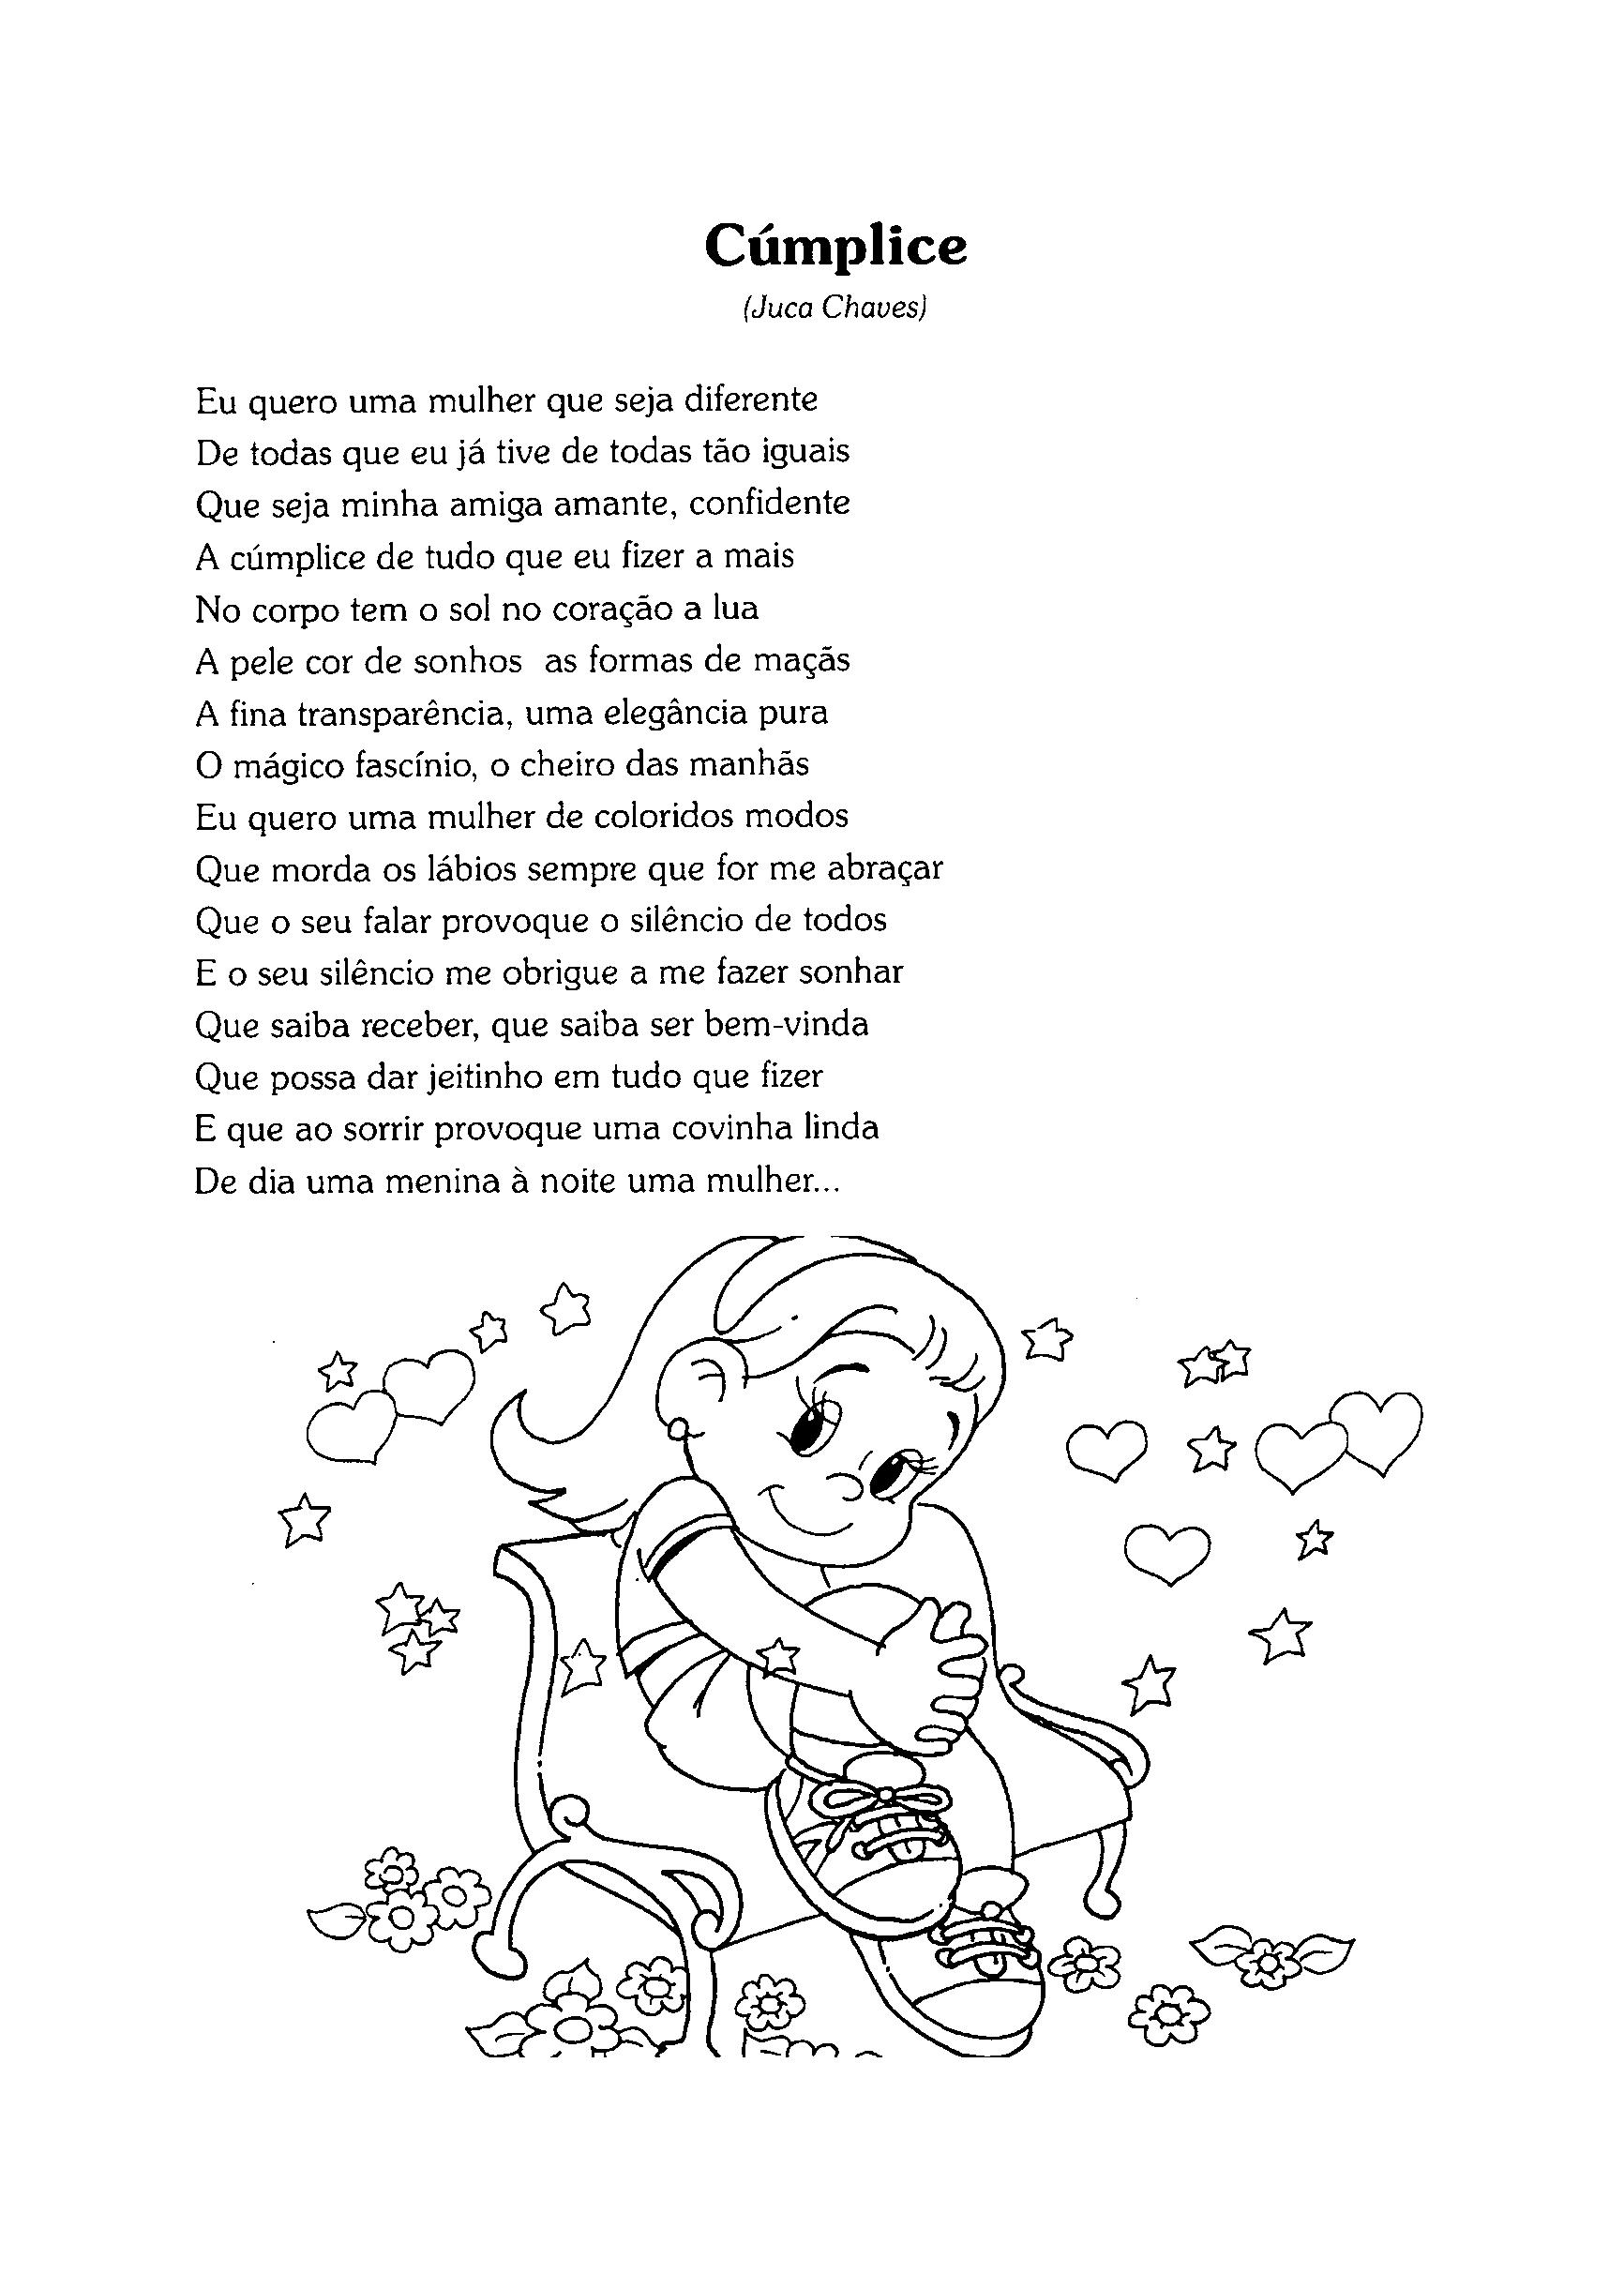 letra-musica-cumplice